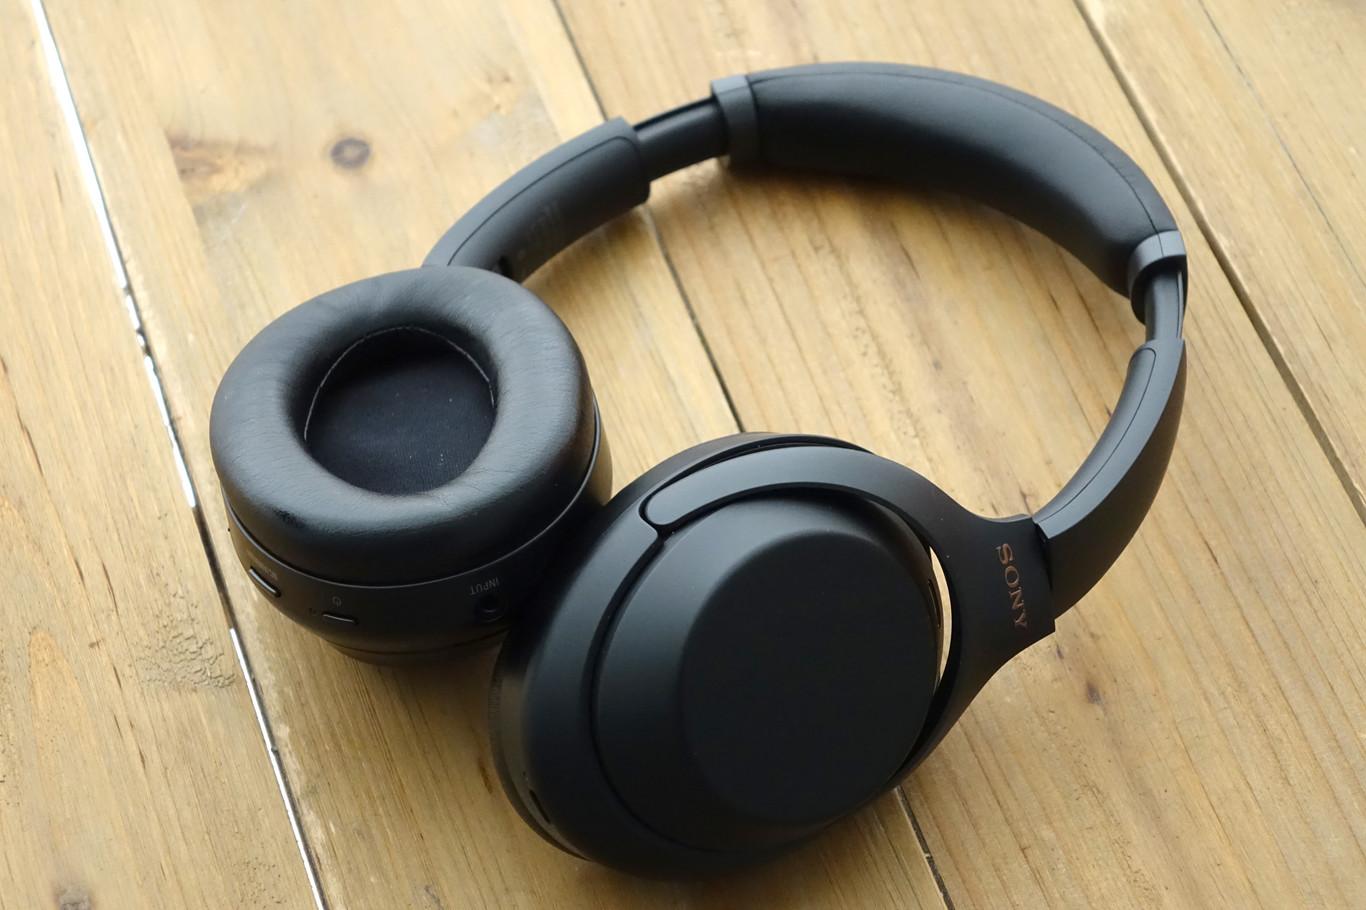 Sony WH 1000XM3B Auriculares de Diadema inalámbricos (Bluetooth, Hi Res Audio, Noise Cancelling, Sense Engine, Asistente de Voz, 30h de autonomía de